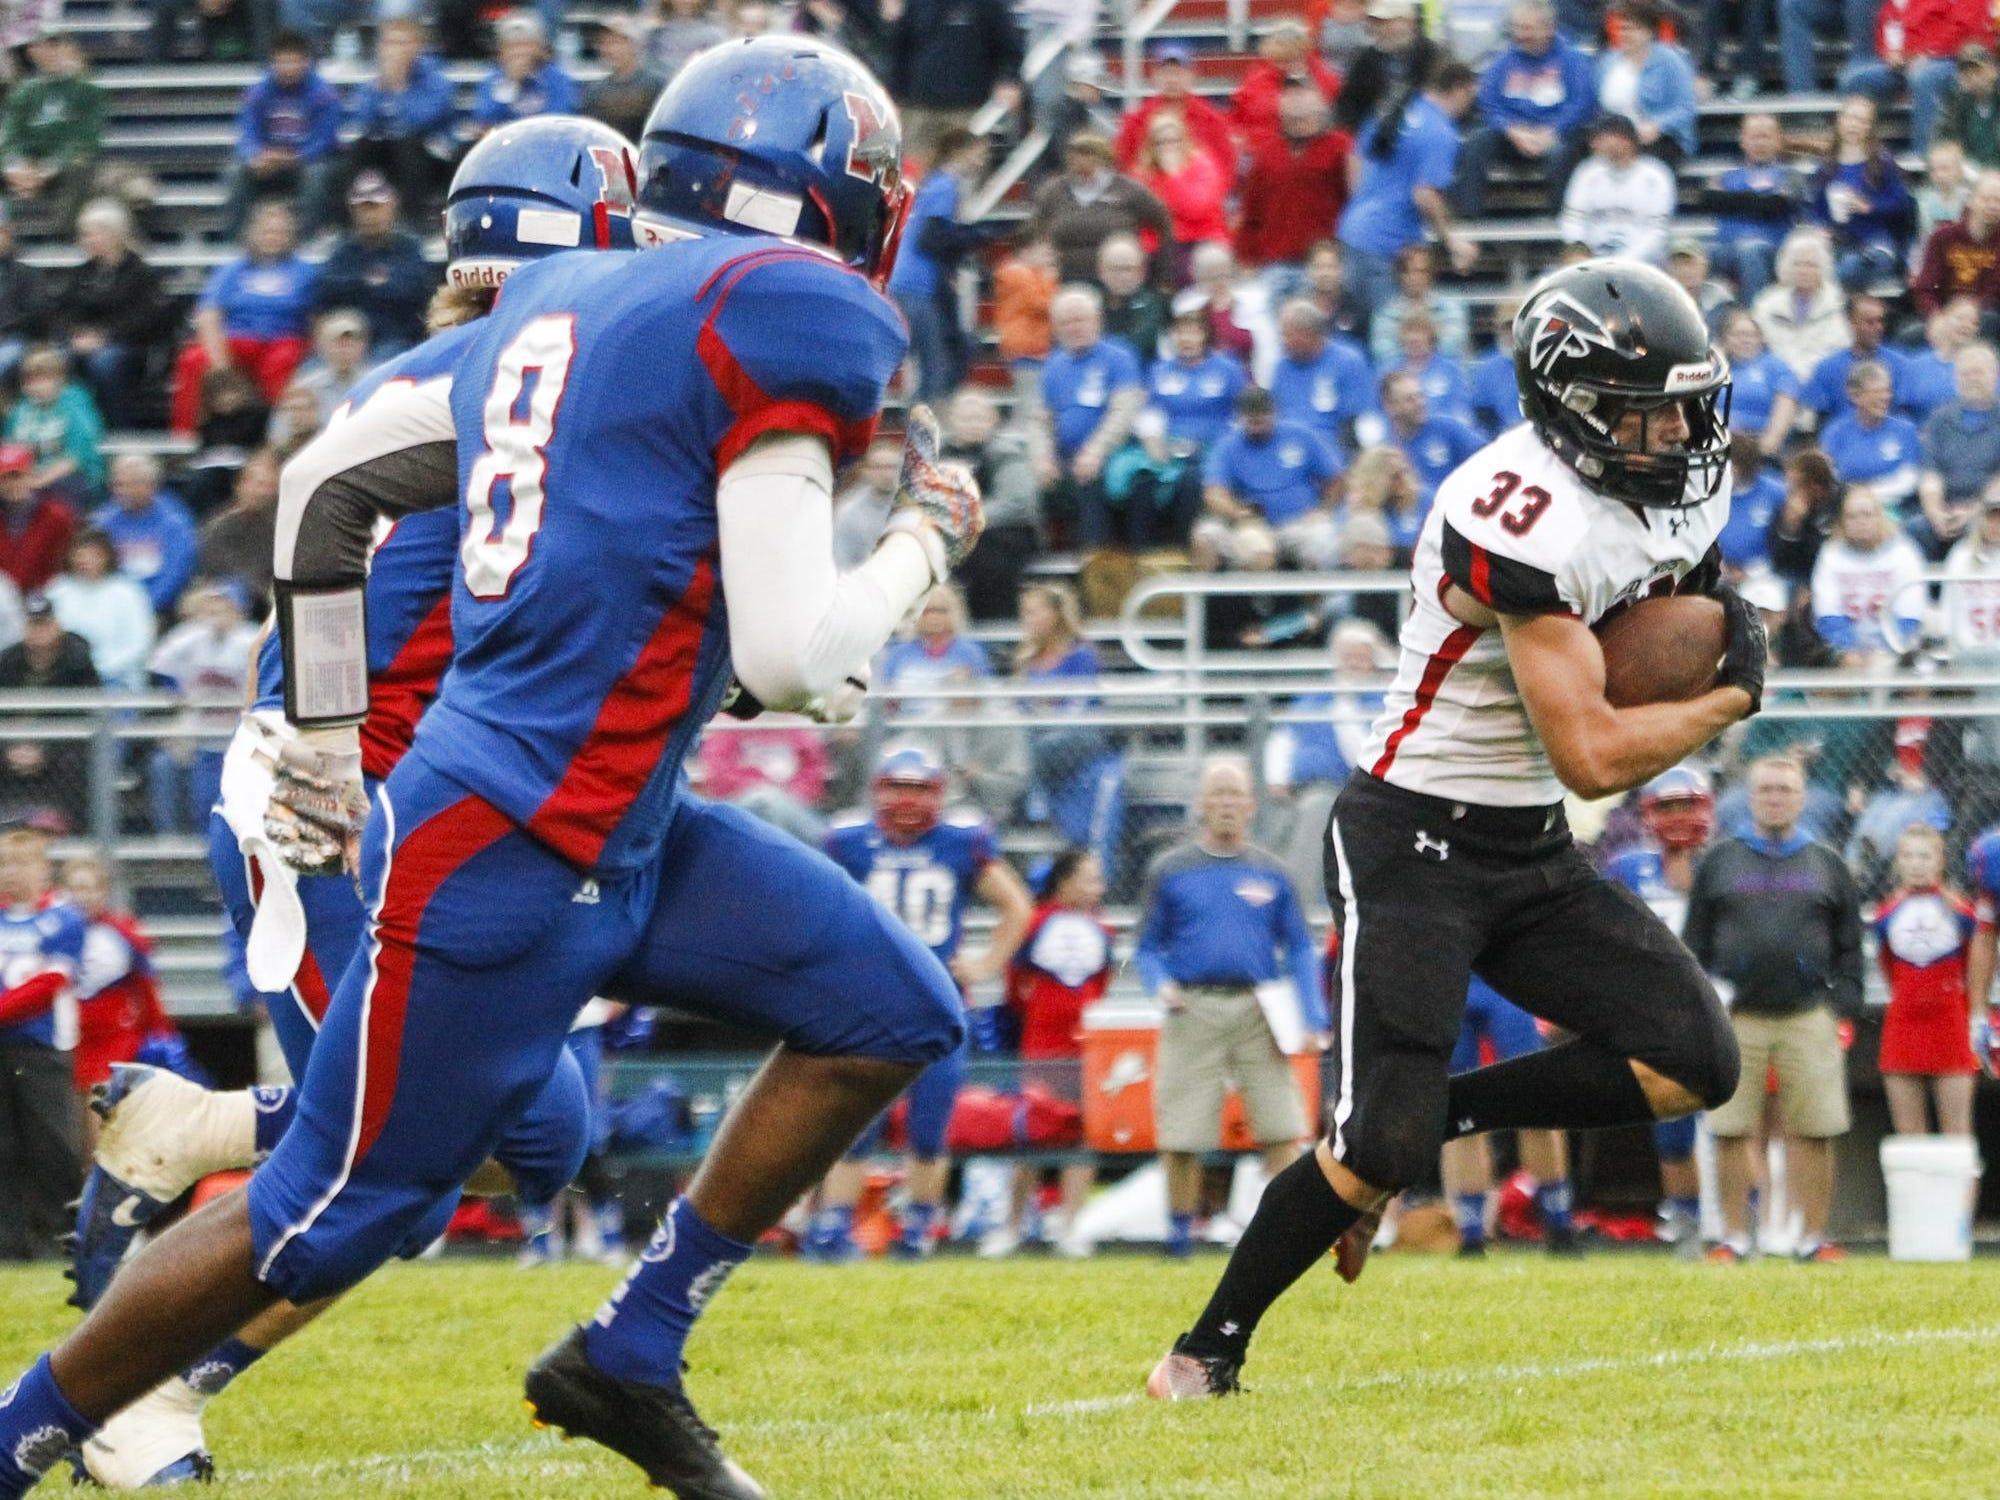 Blake Stewart, the LSJ prep athlete of the week, ran for 267 yards against Mason.